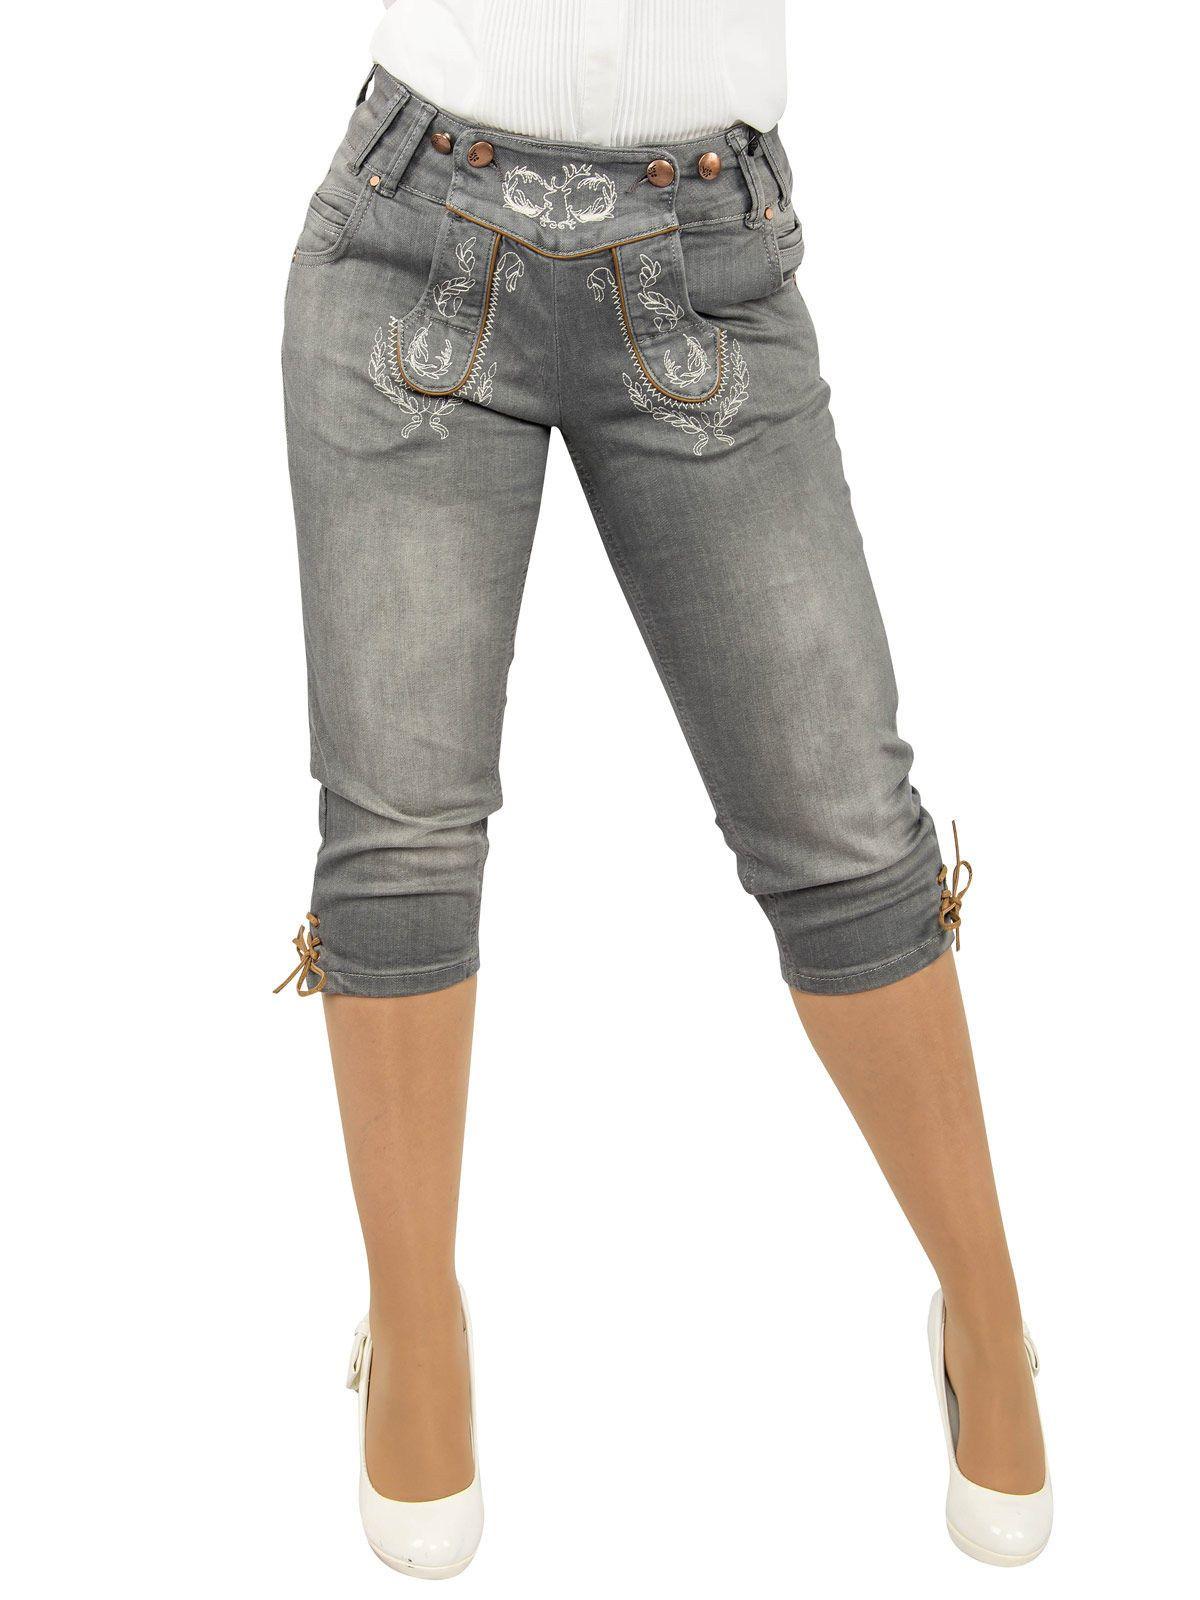 trachtenjeans damen marjo damen jeans kniebundhose. Black Bedroom Furniture Sets. Home Design Ideas